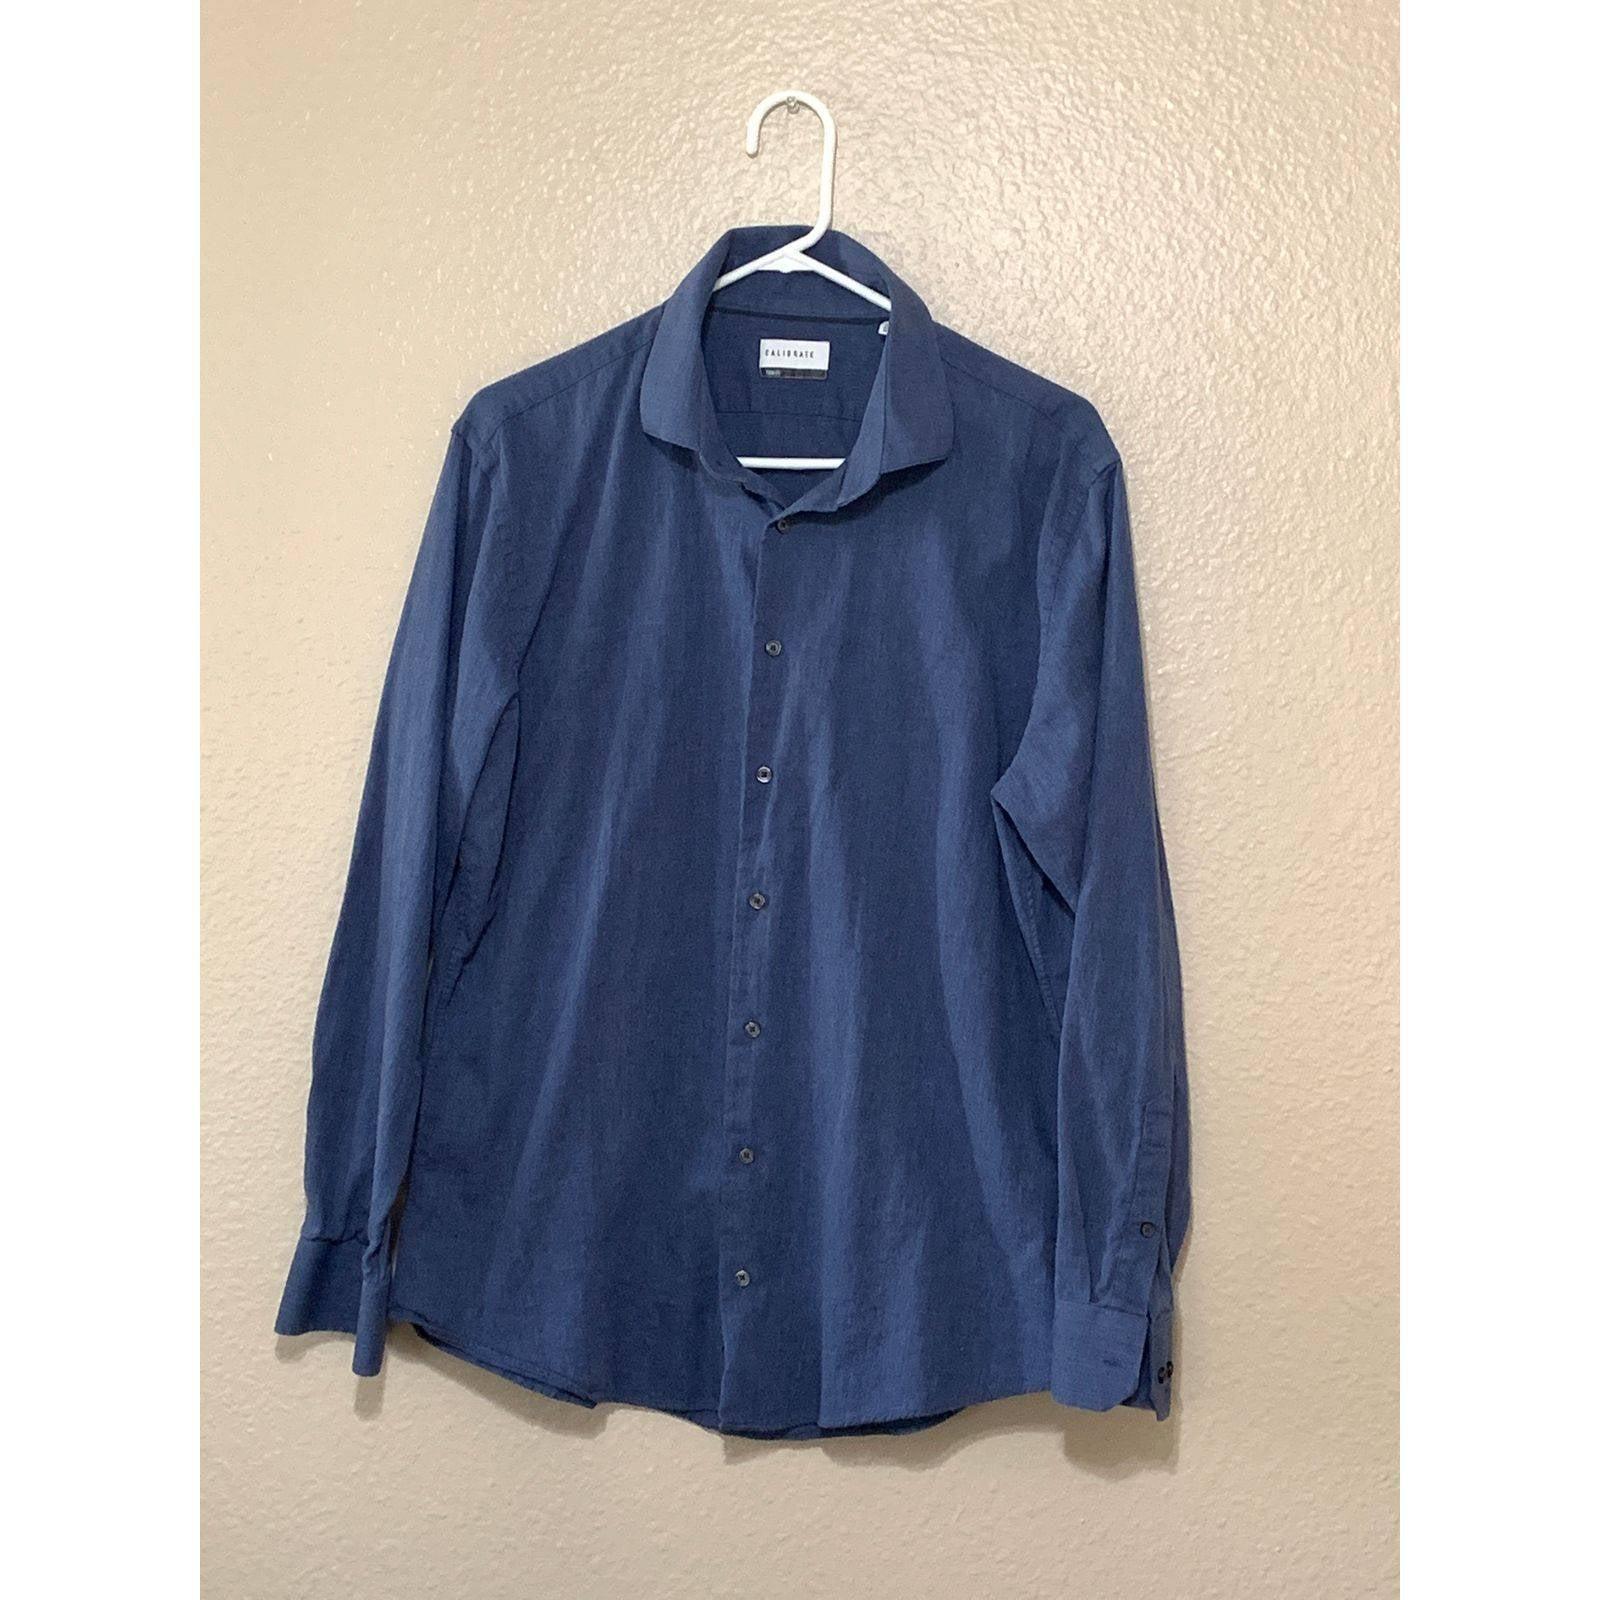 CALIBRATE Blue trim fit dress shirt 17